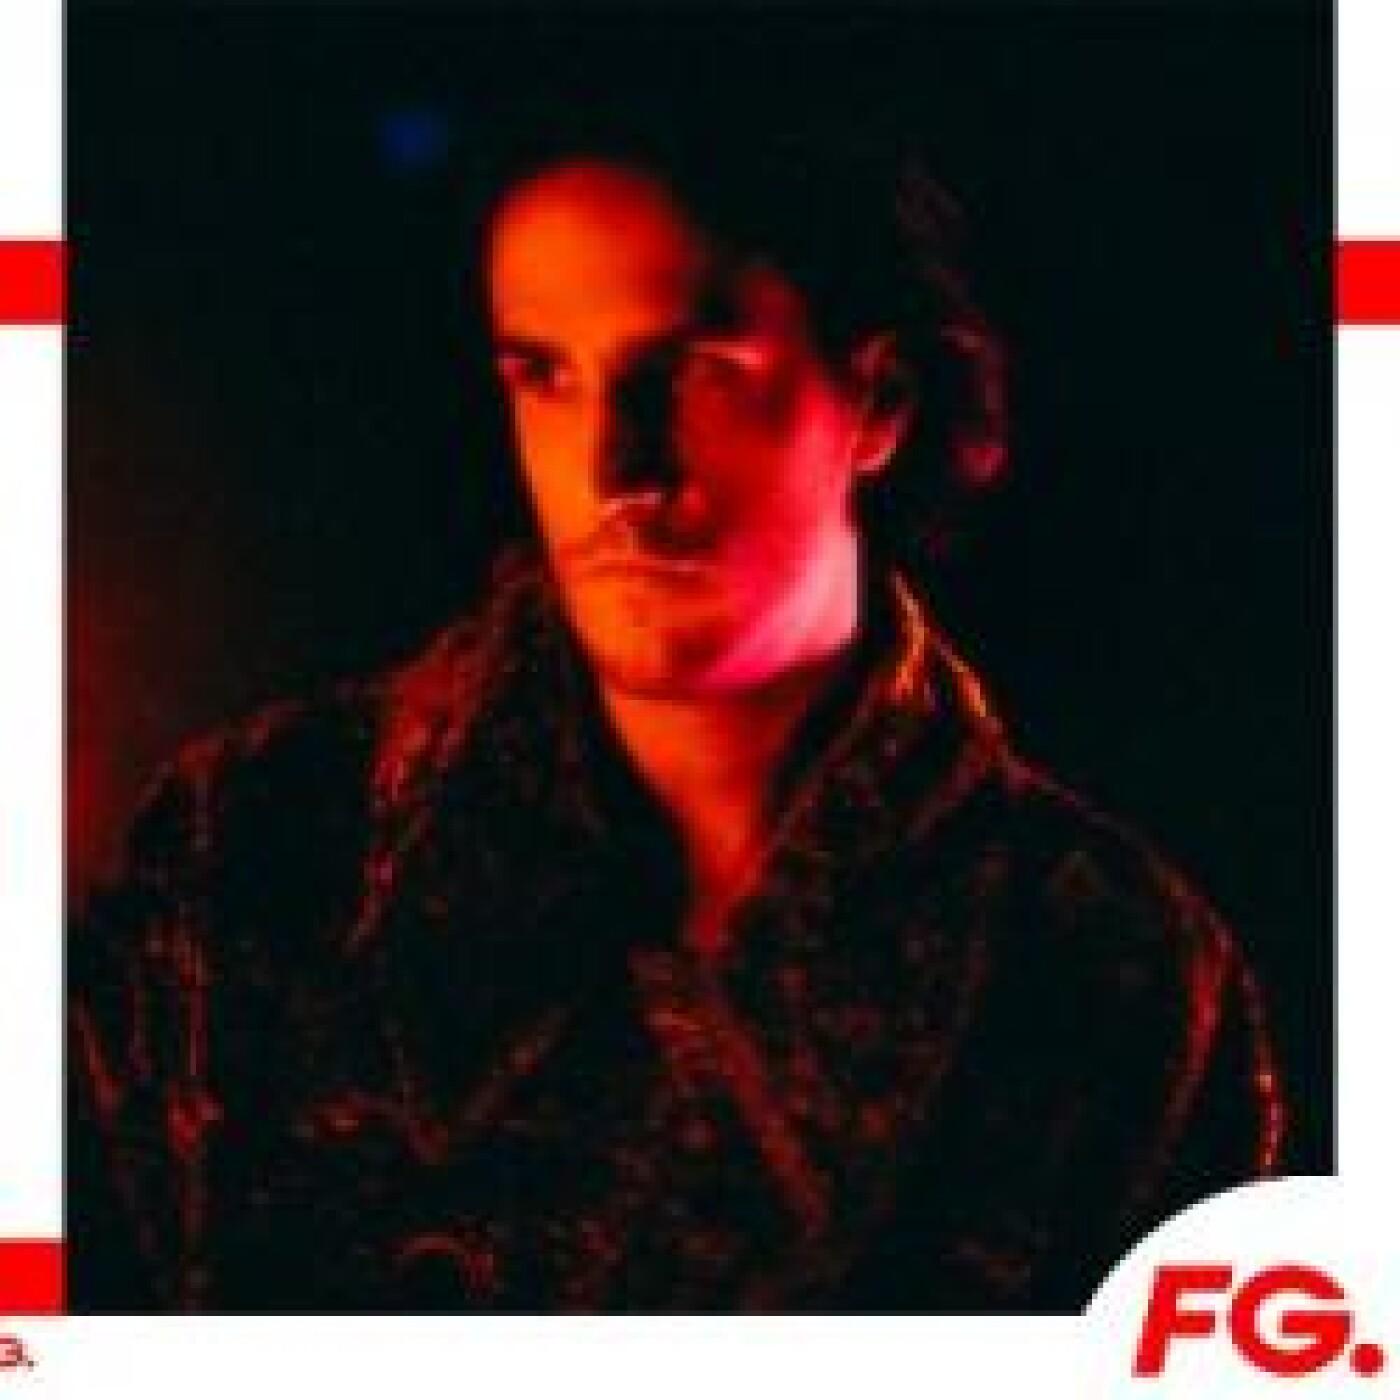 CLUB FG : JOE LEWANDOWSKI